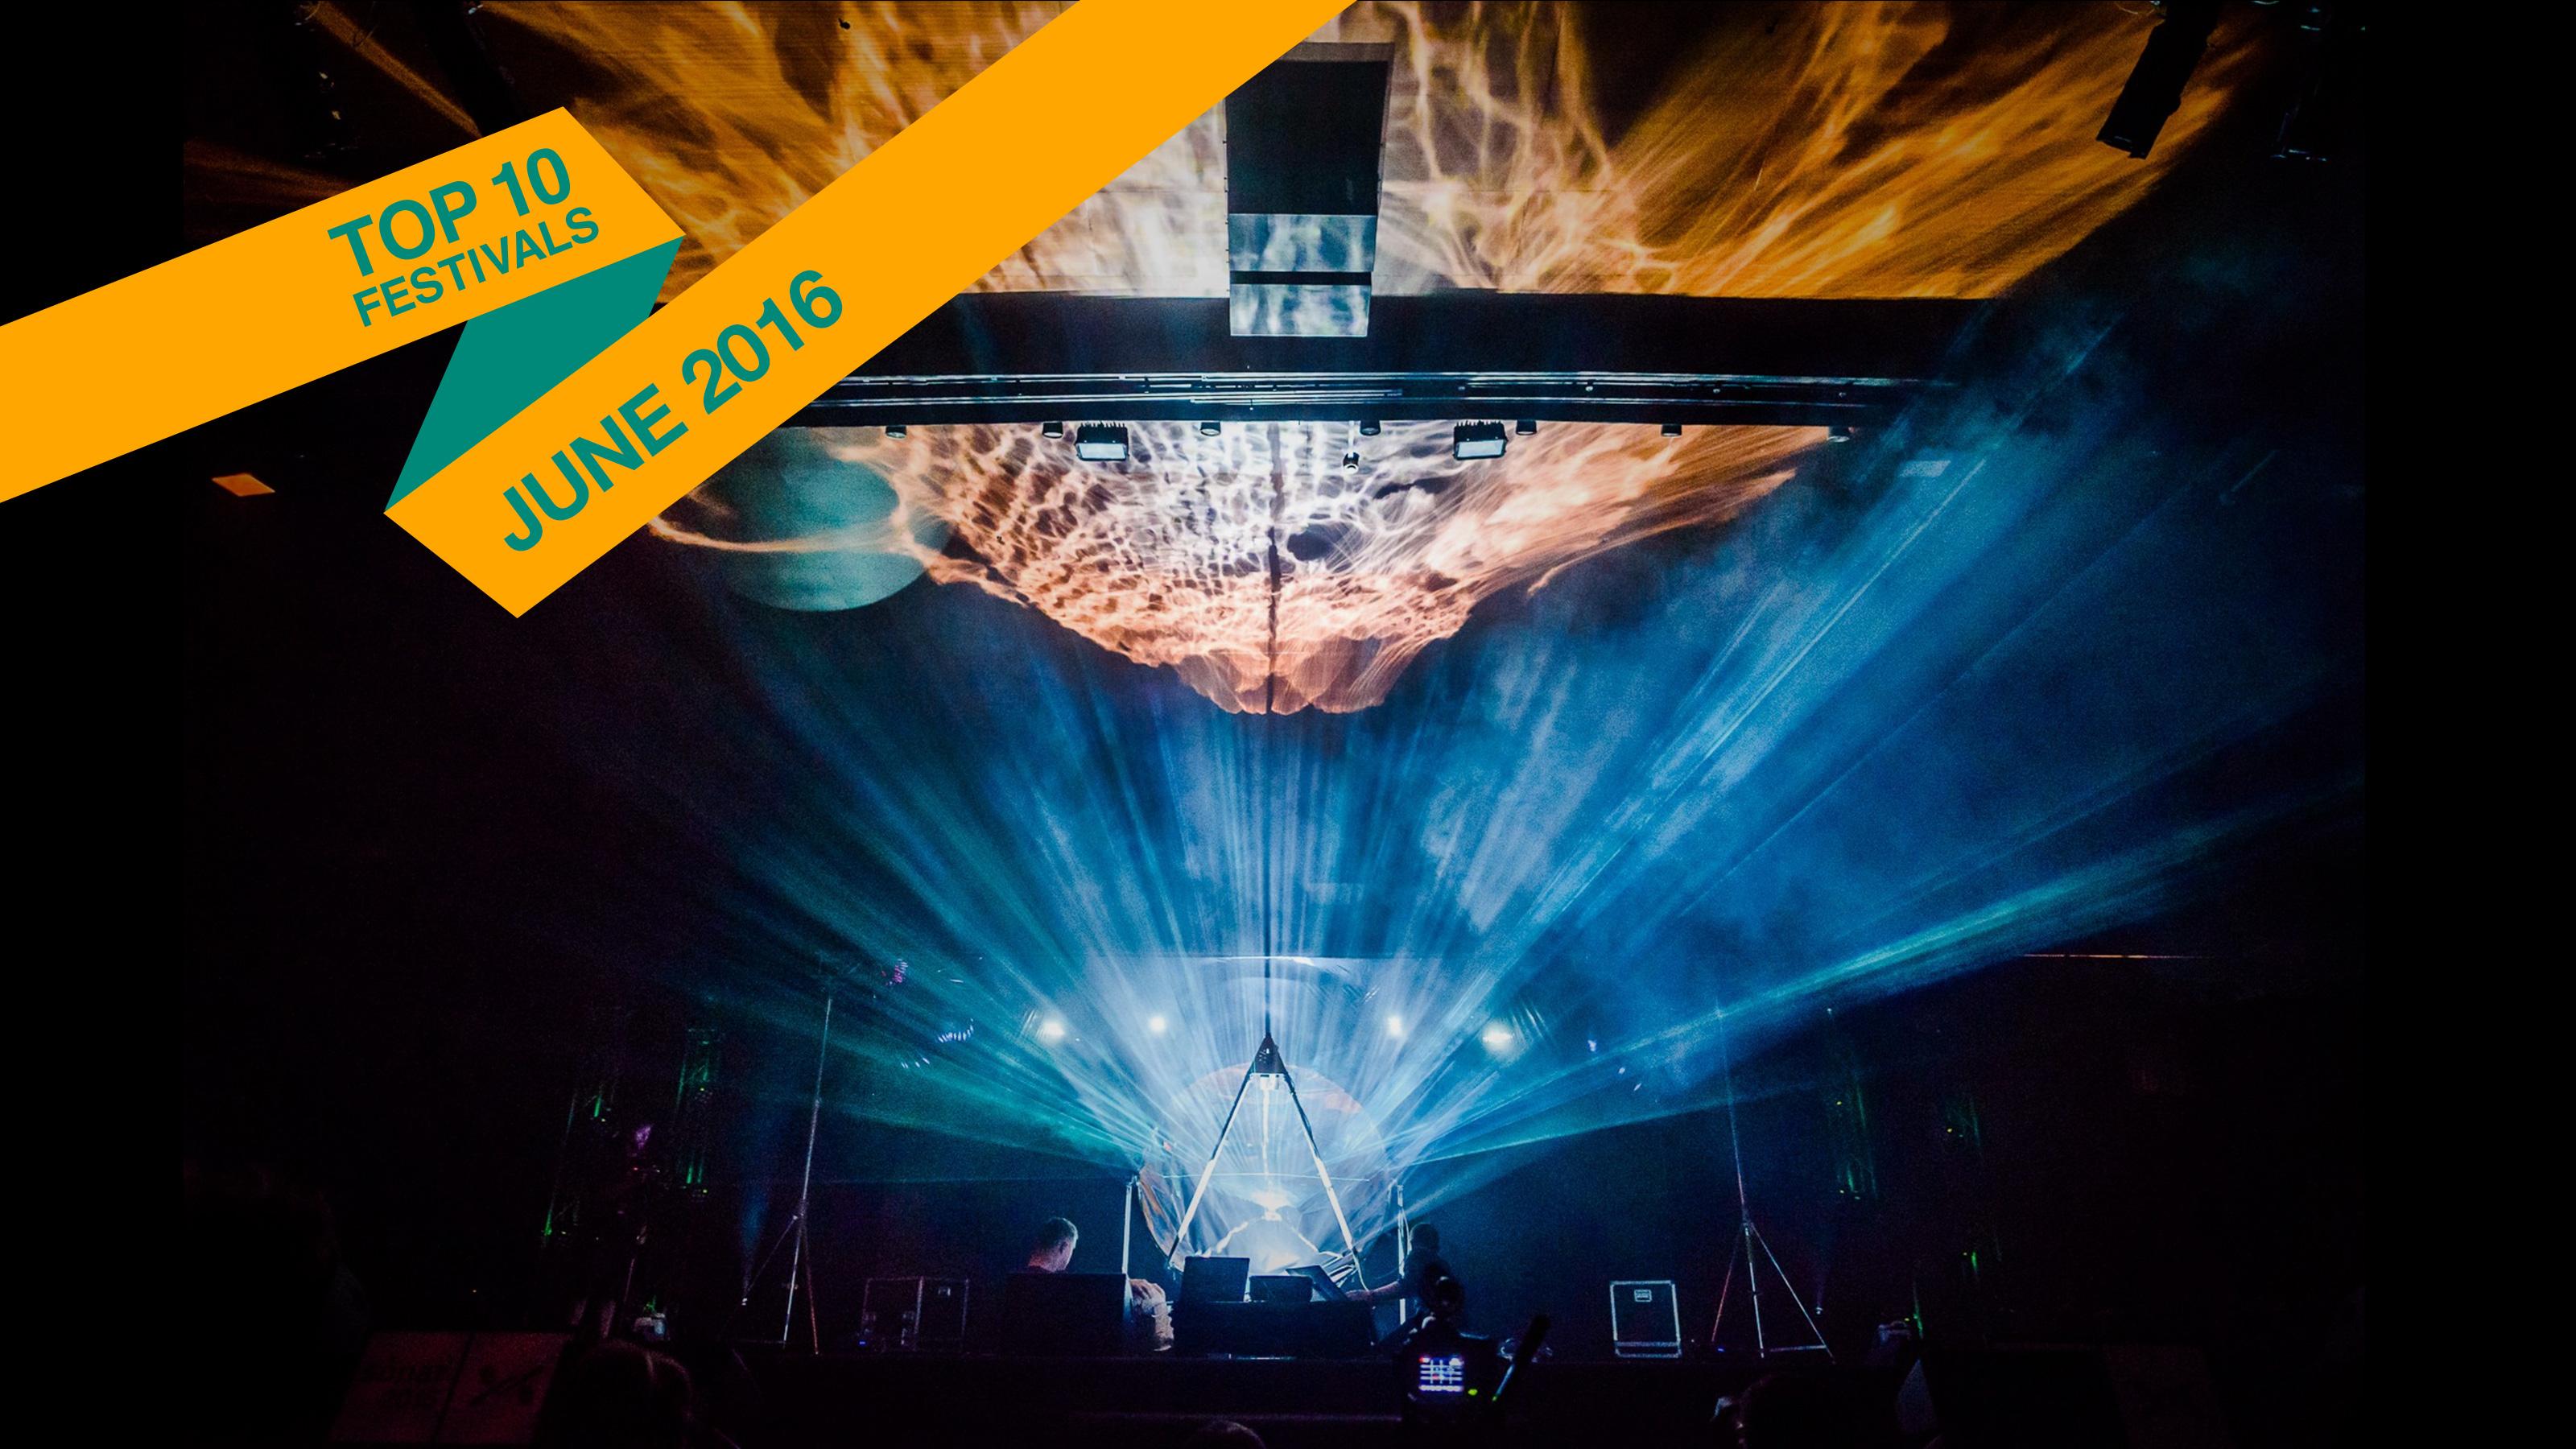 Top 10 June 2016 Festivals